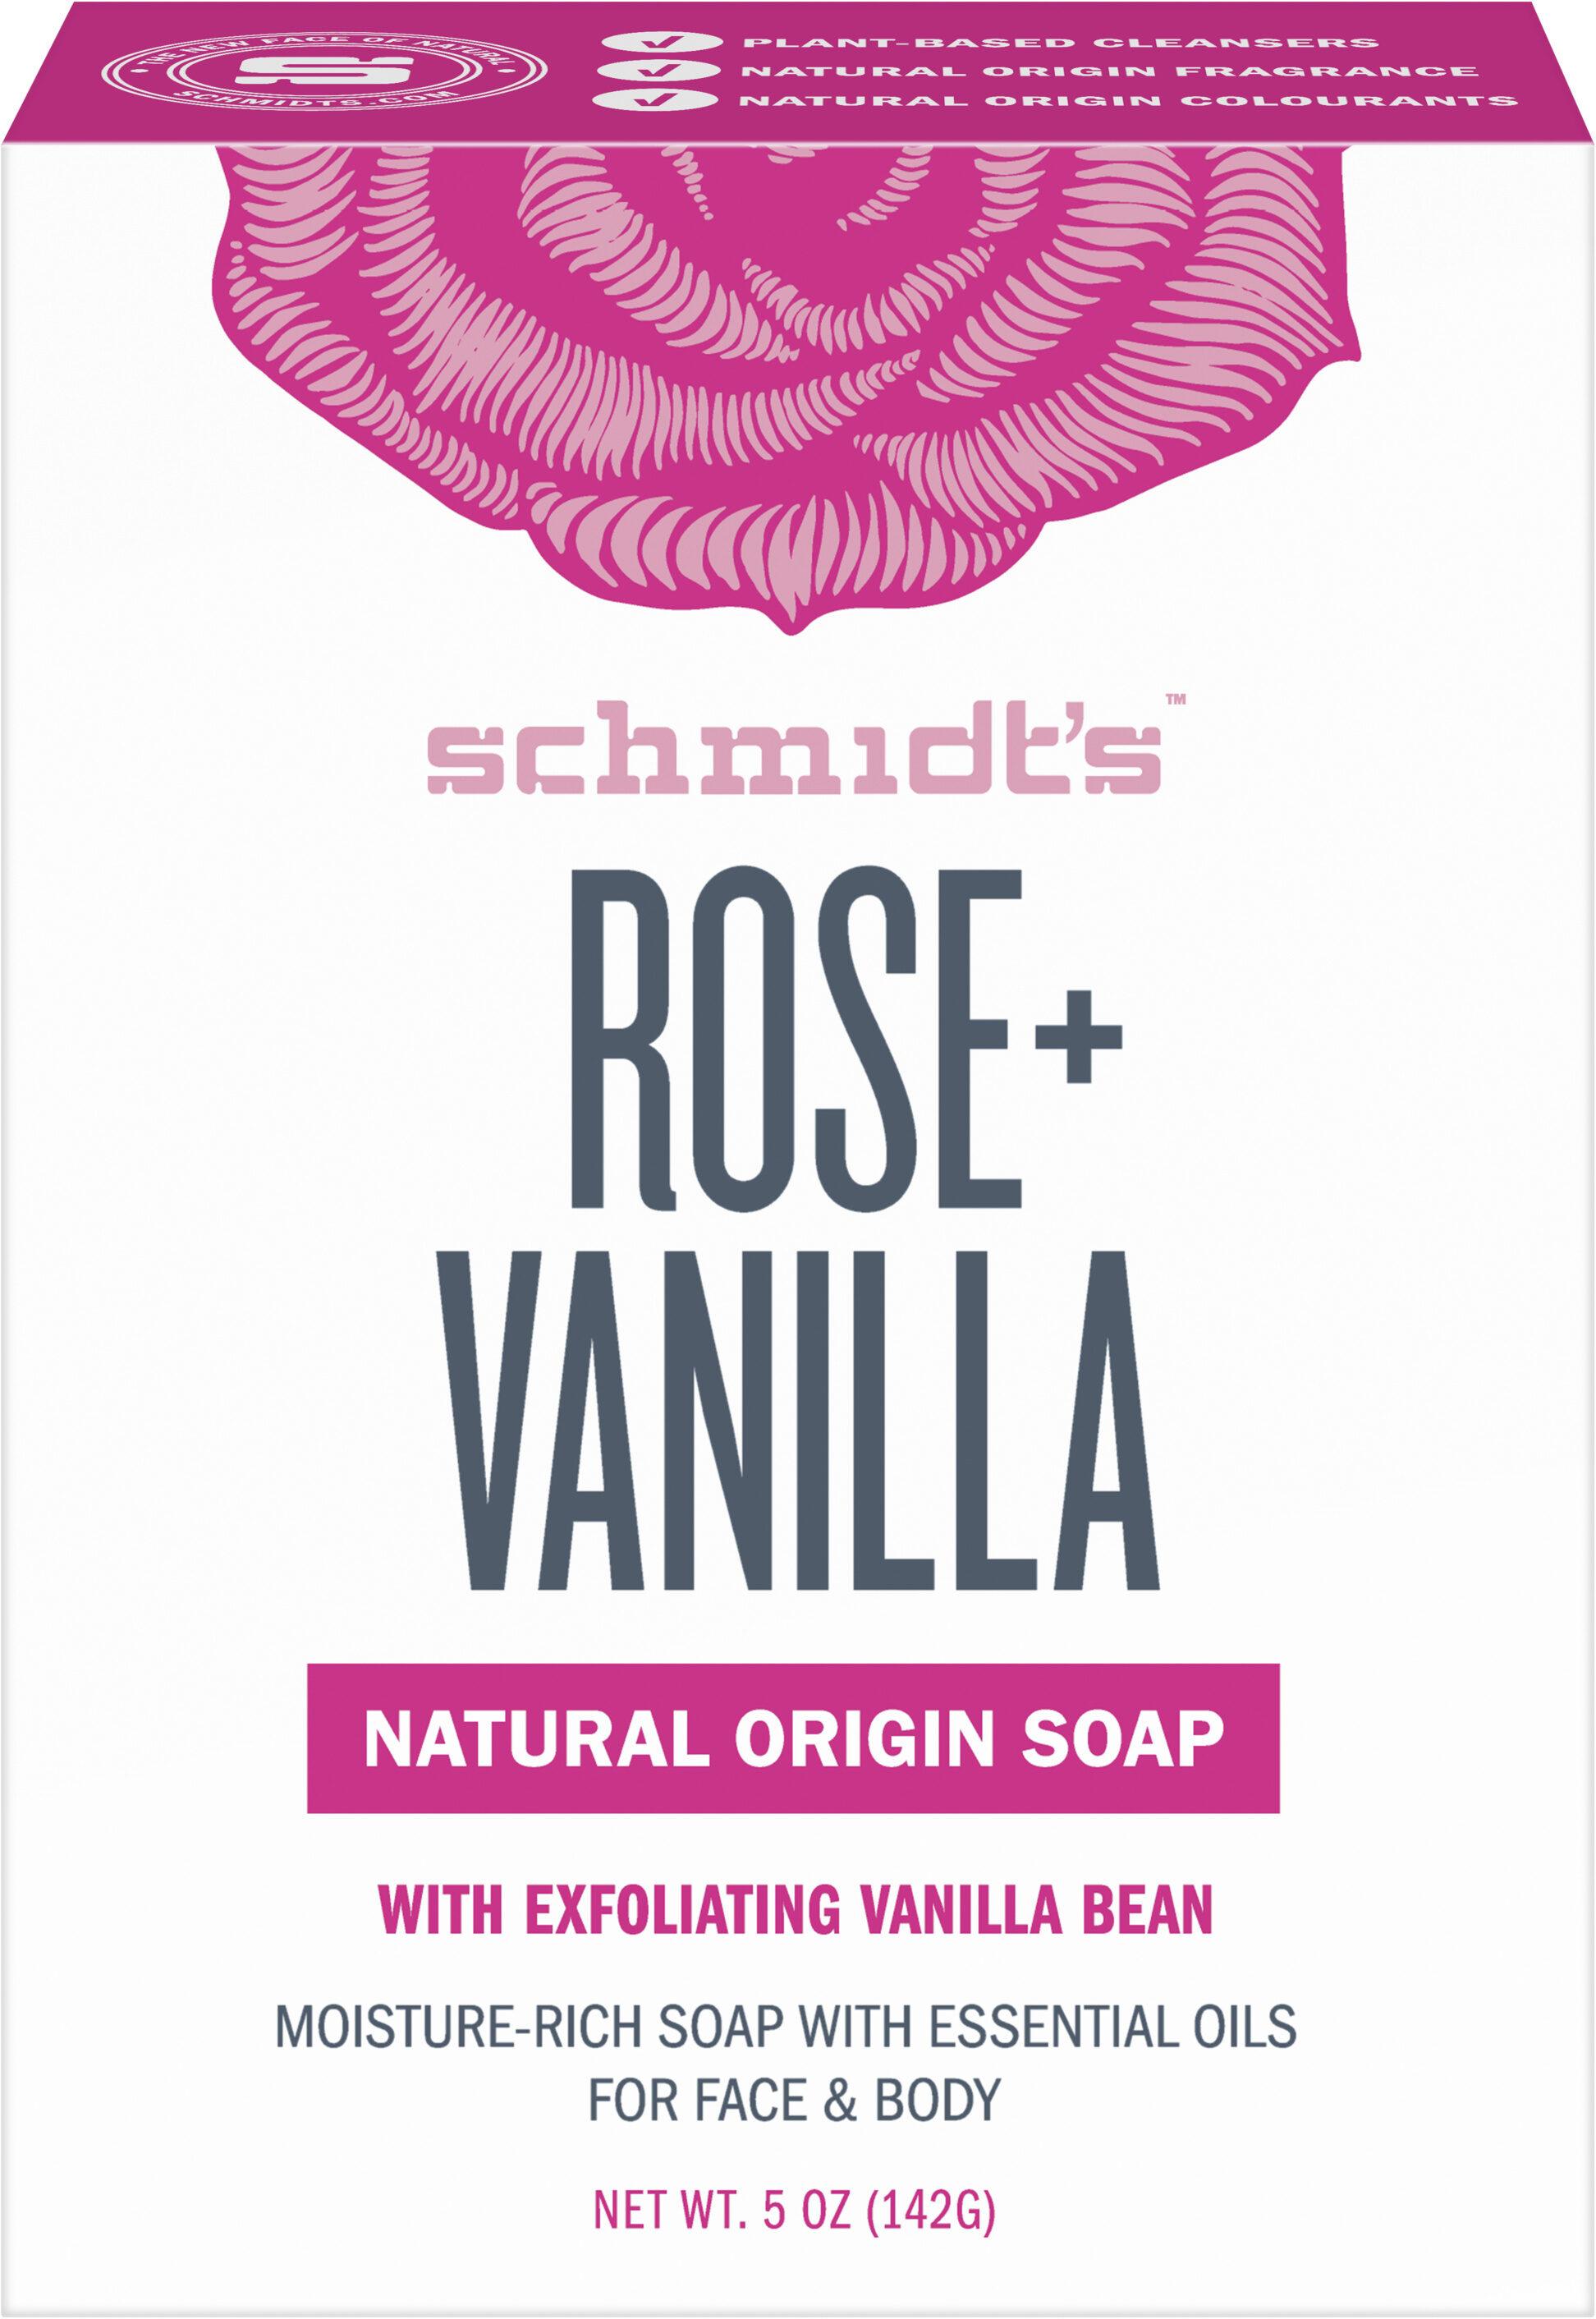 Schmidt's Savon Rose et Vanille - Product - fr